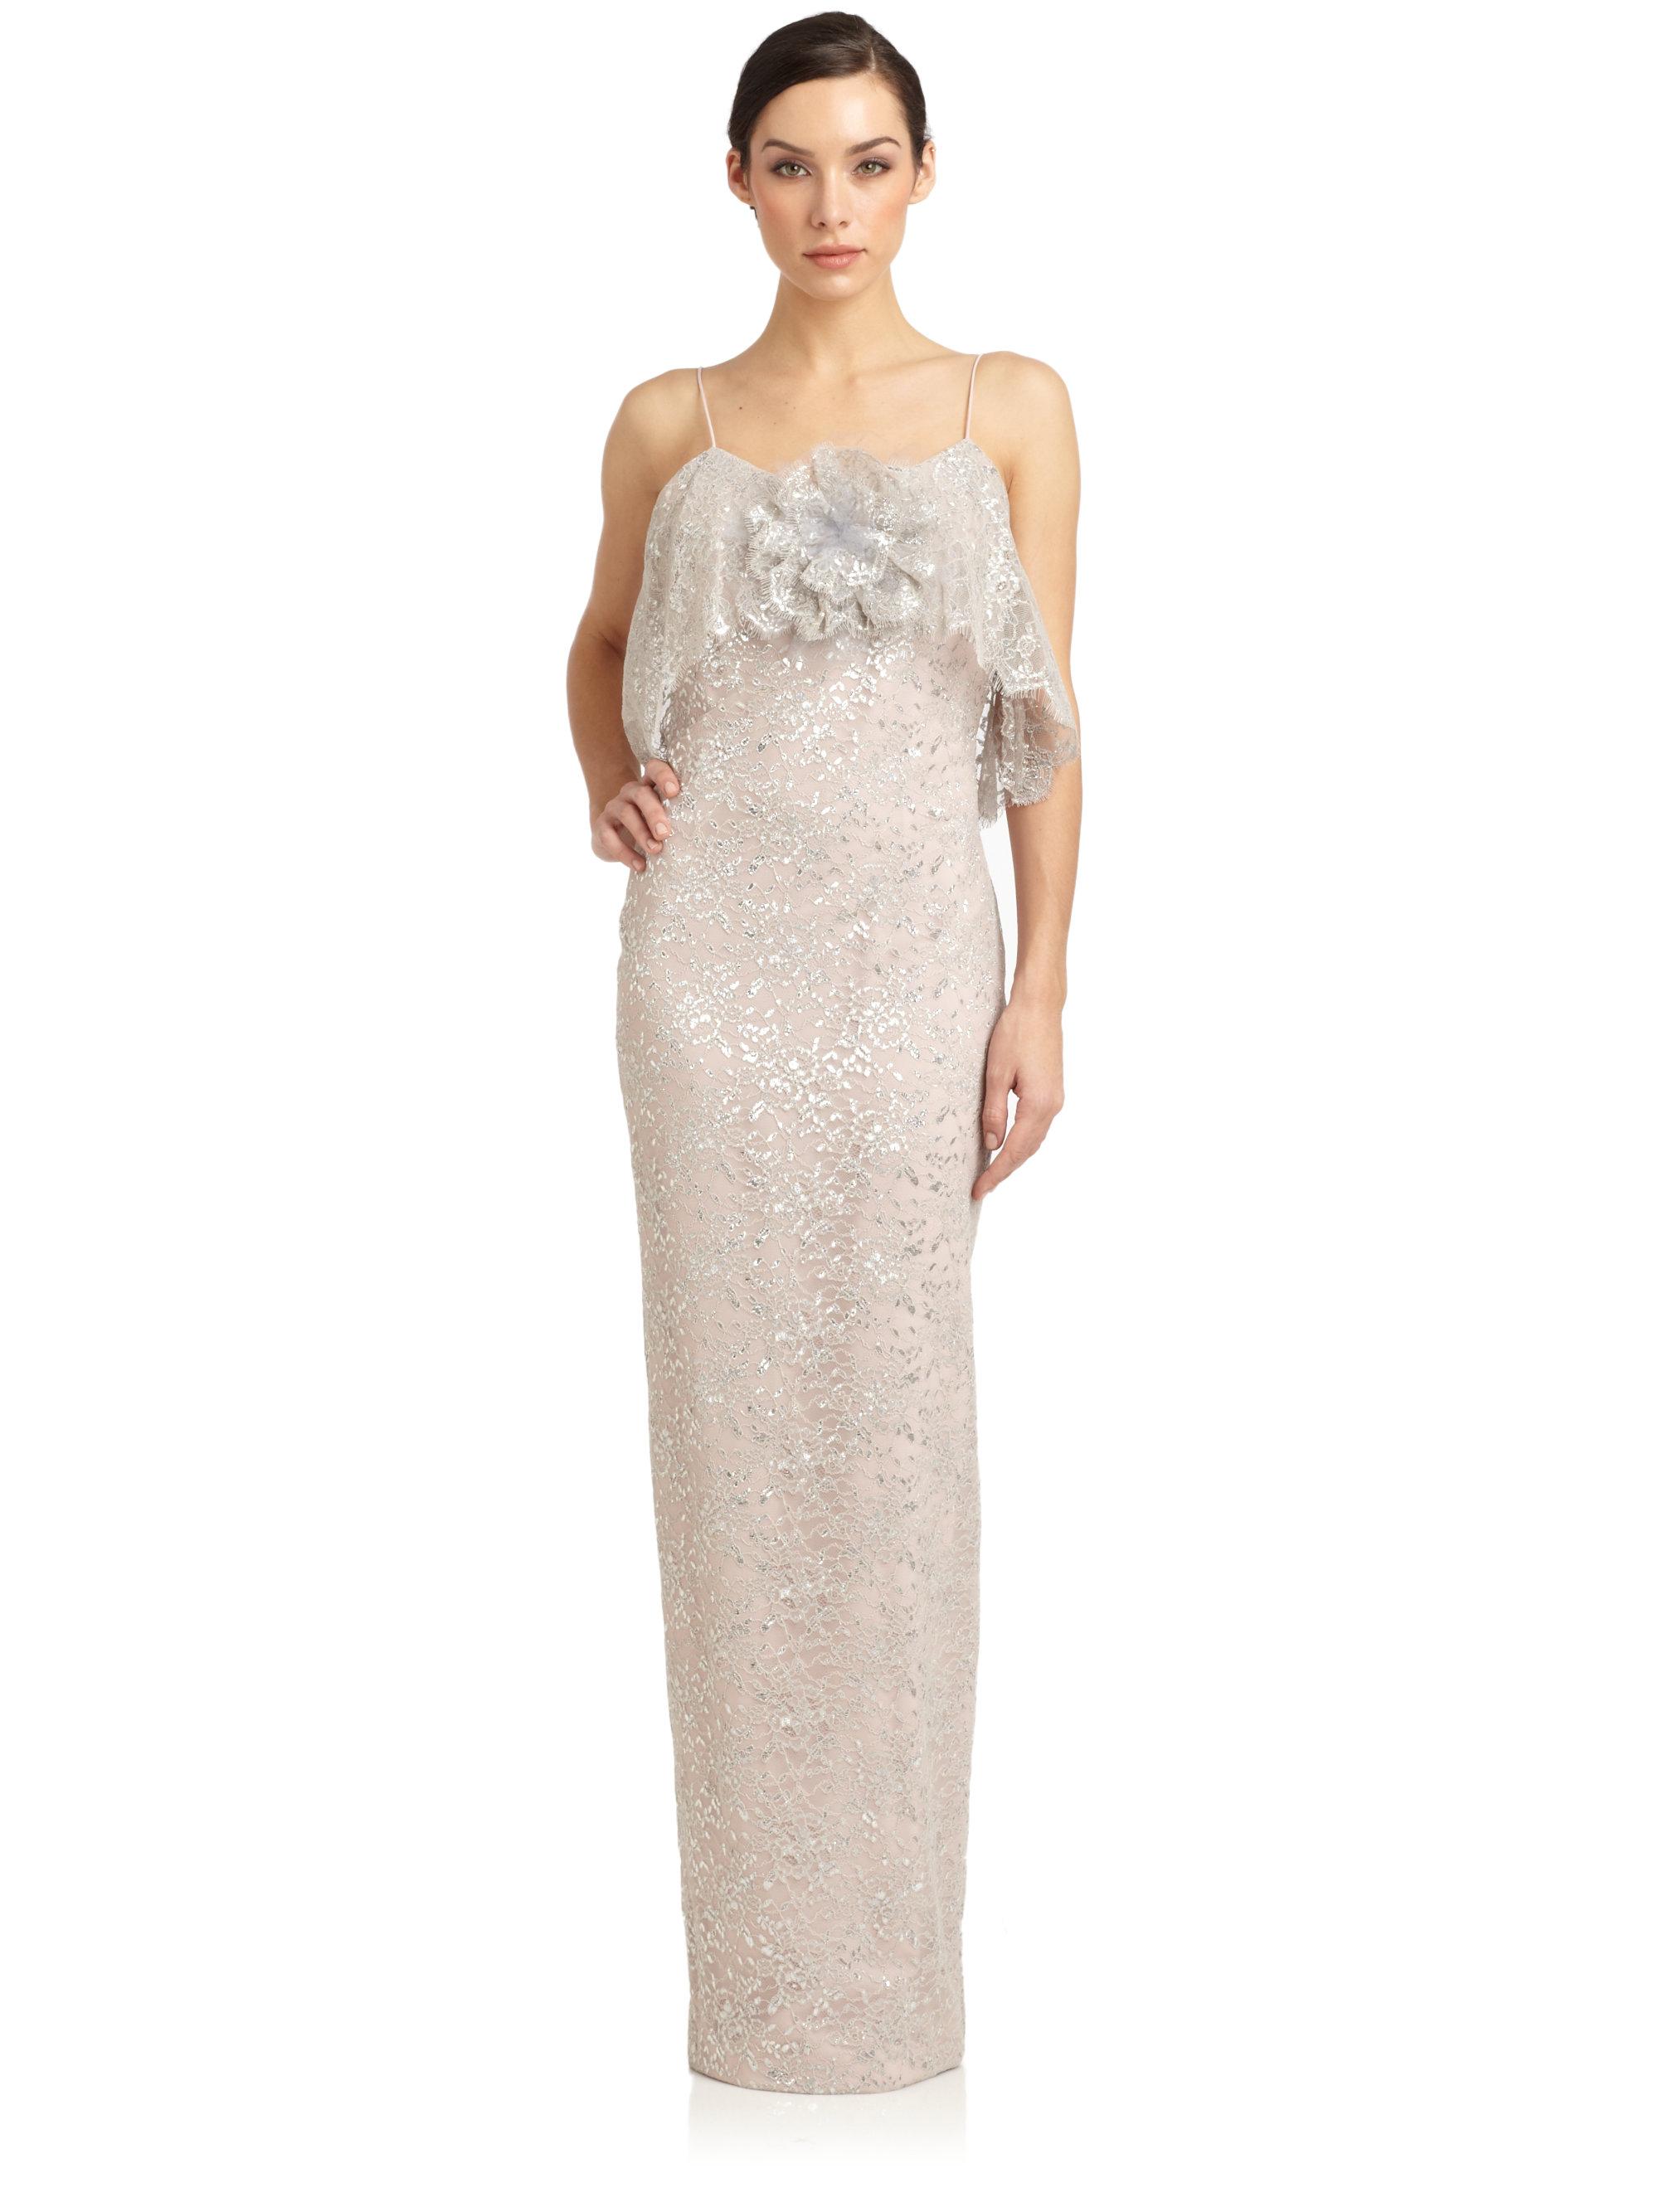 Notte by marchesa Ruffled Lace Slip Dress in Metallic